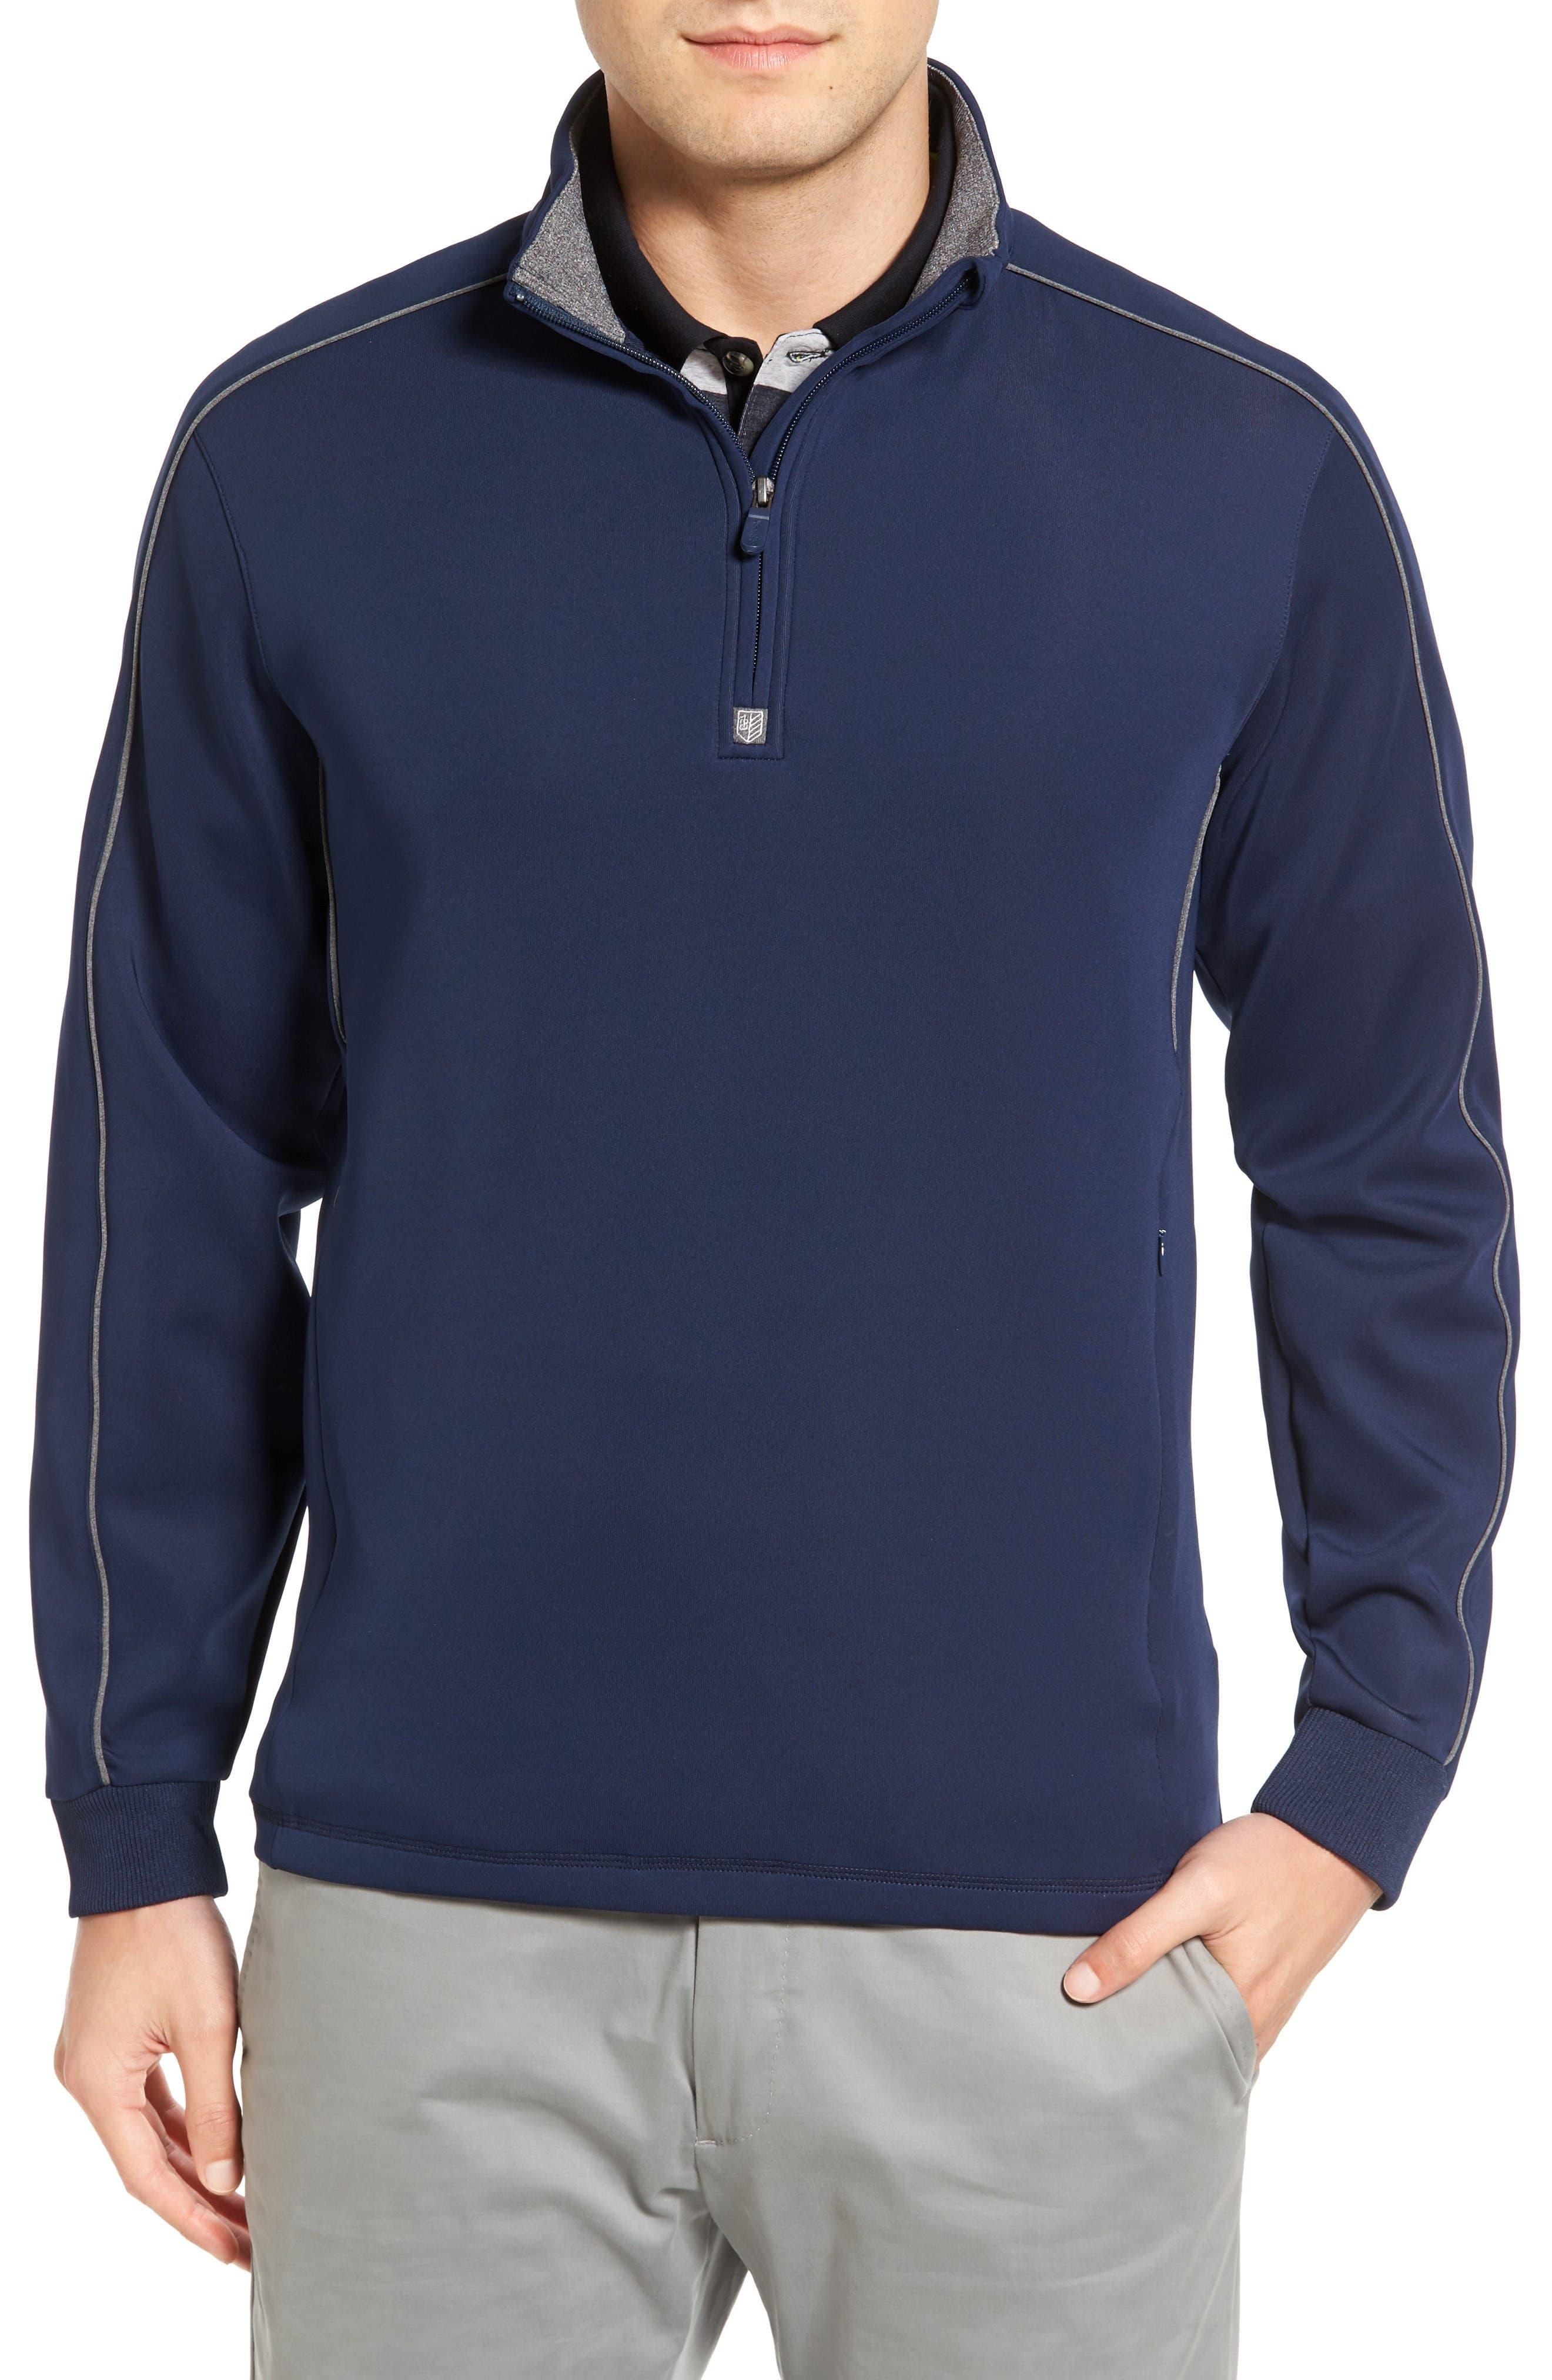 Main Image - Bobby Jones Tech Quarter Zip Pullover